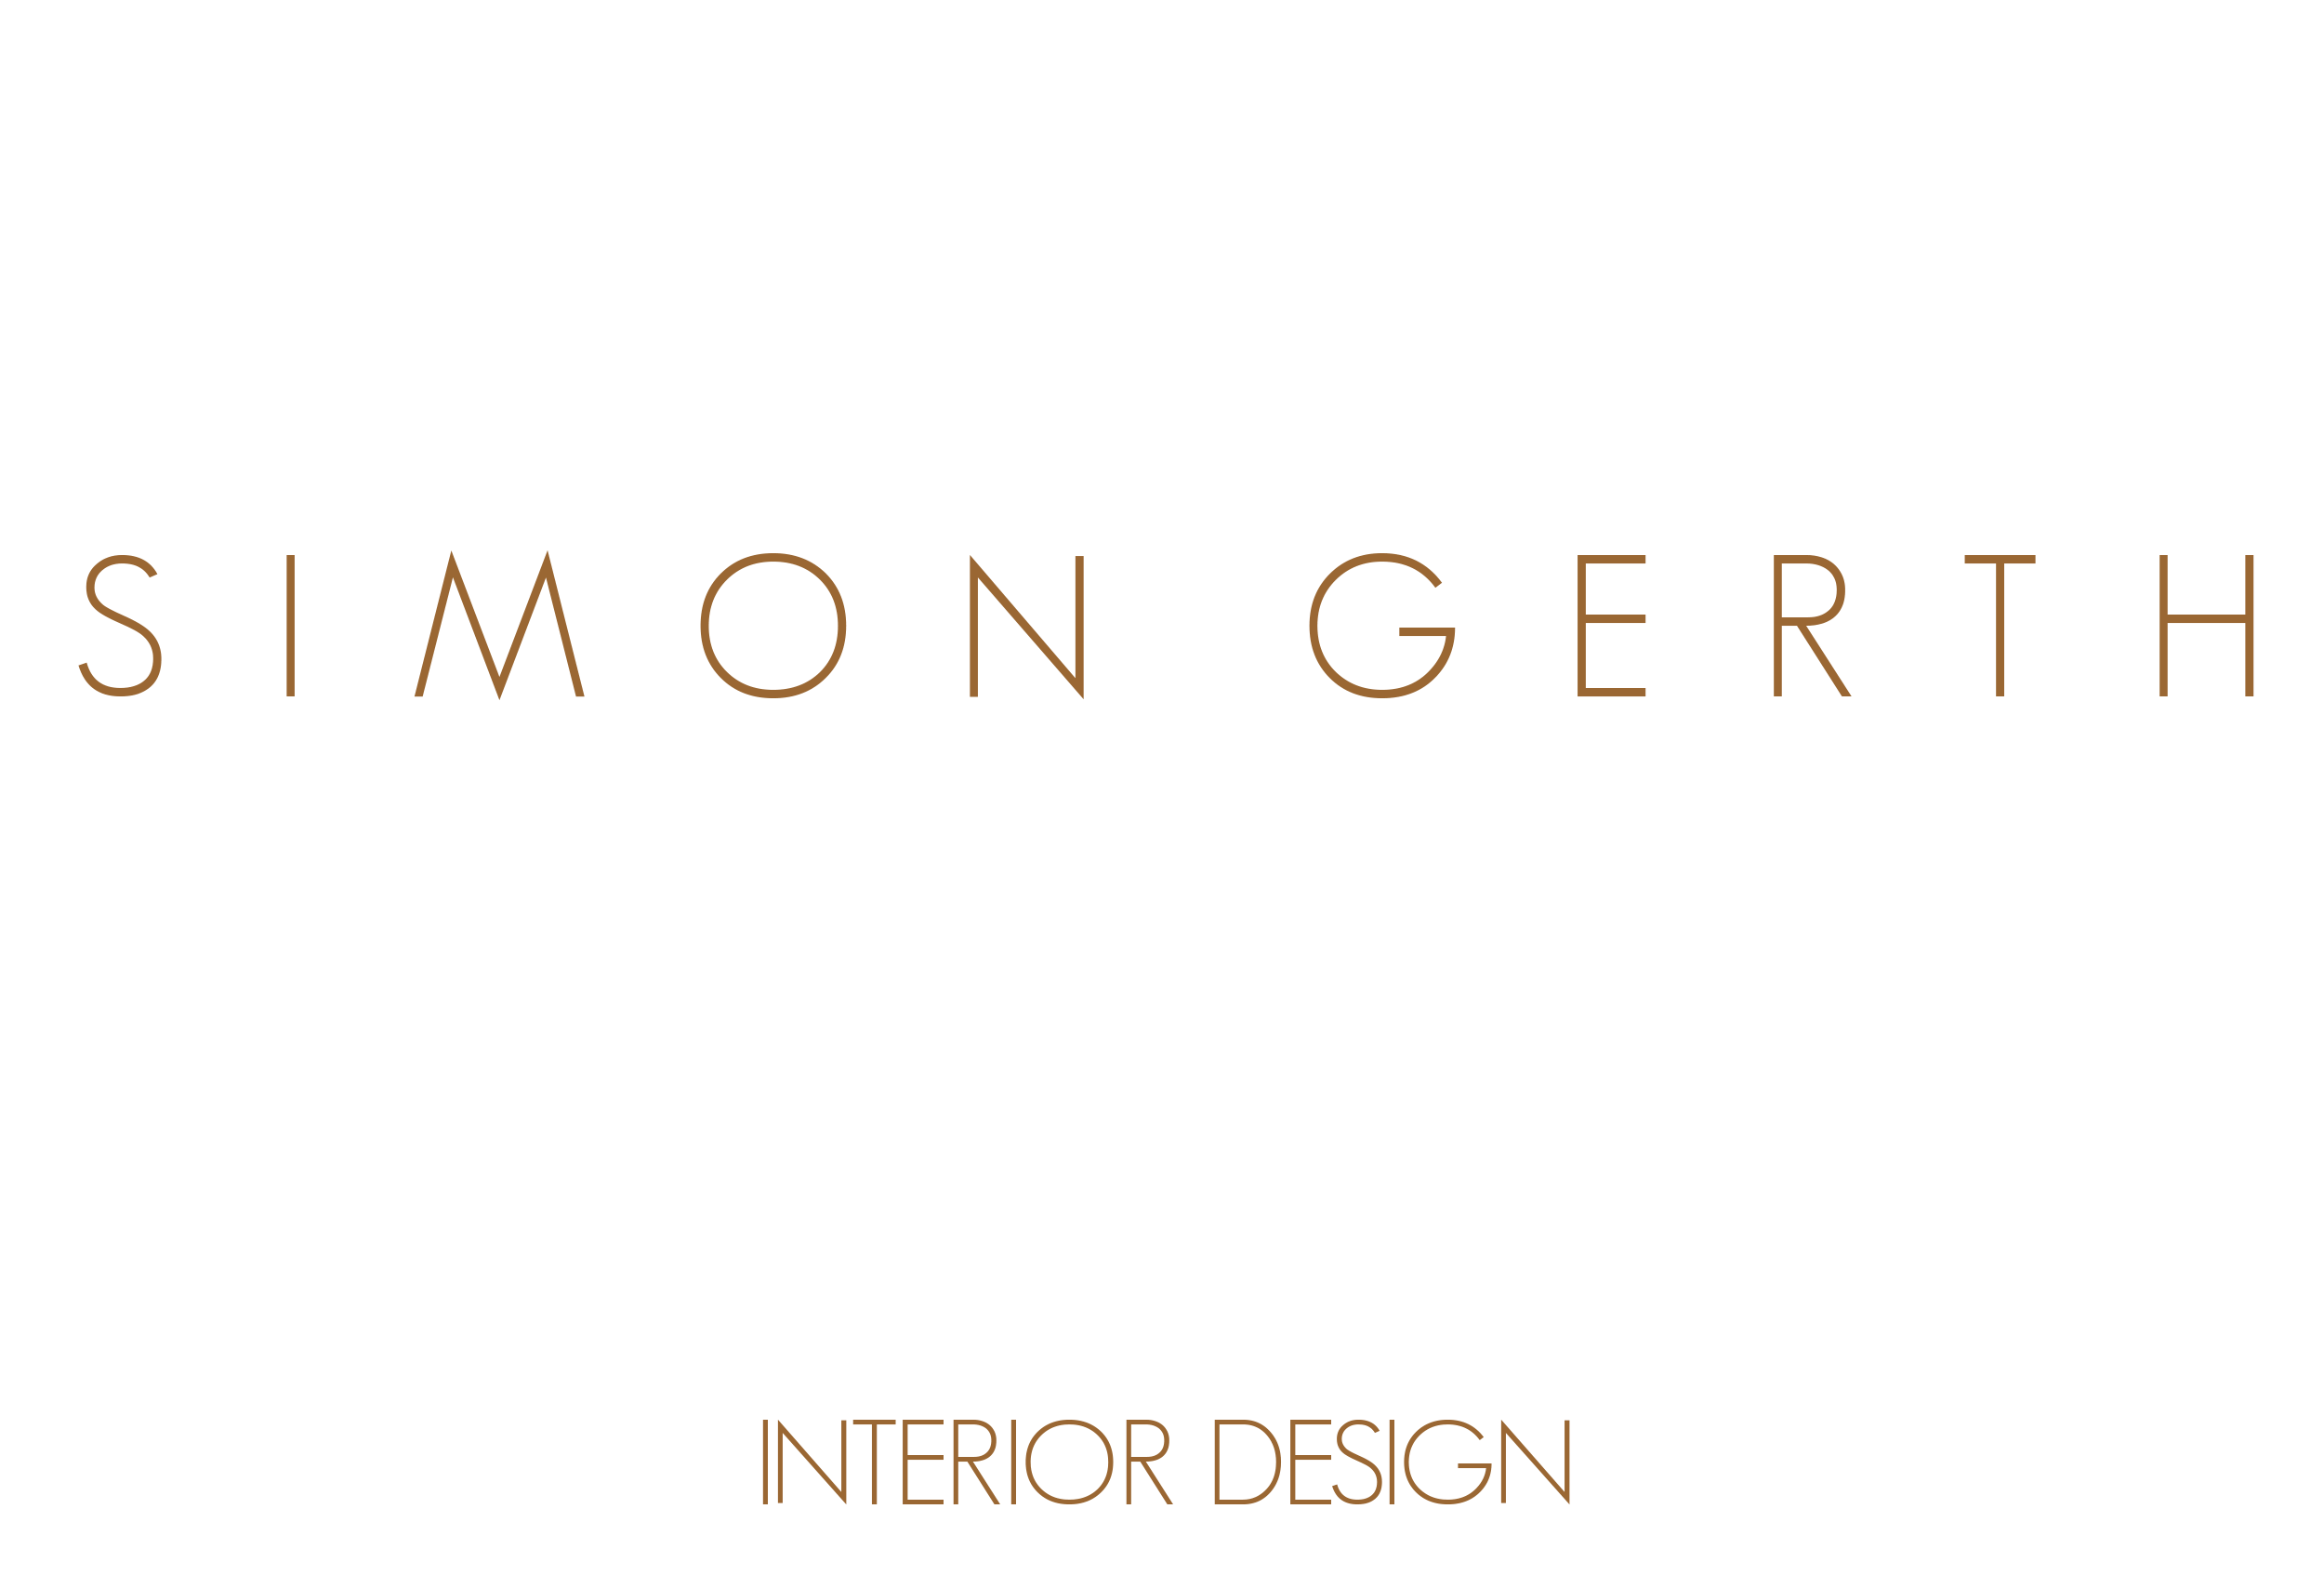 Simon Gerth Retina Logo